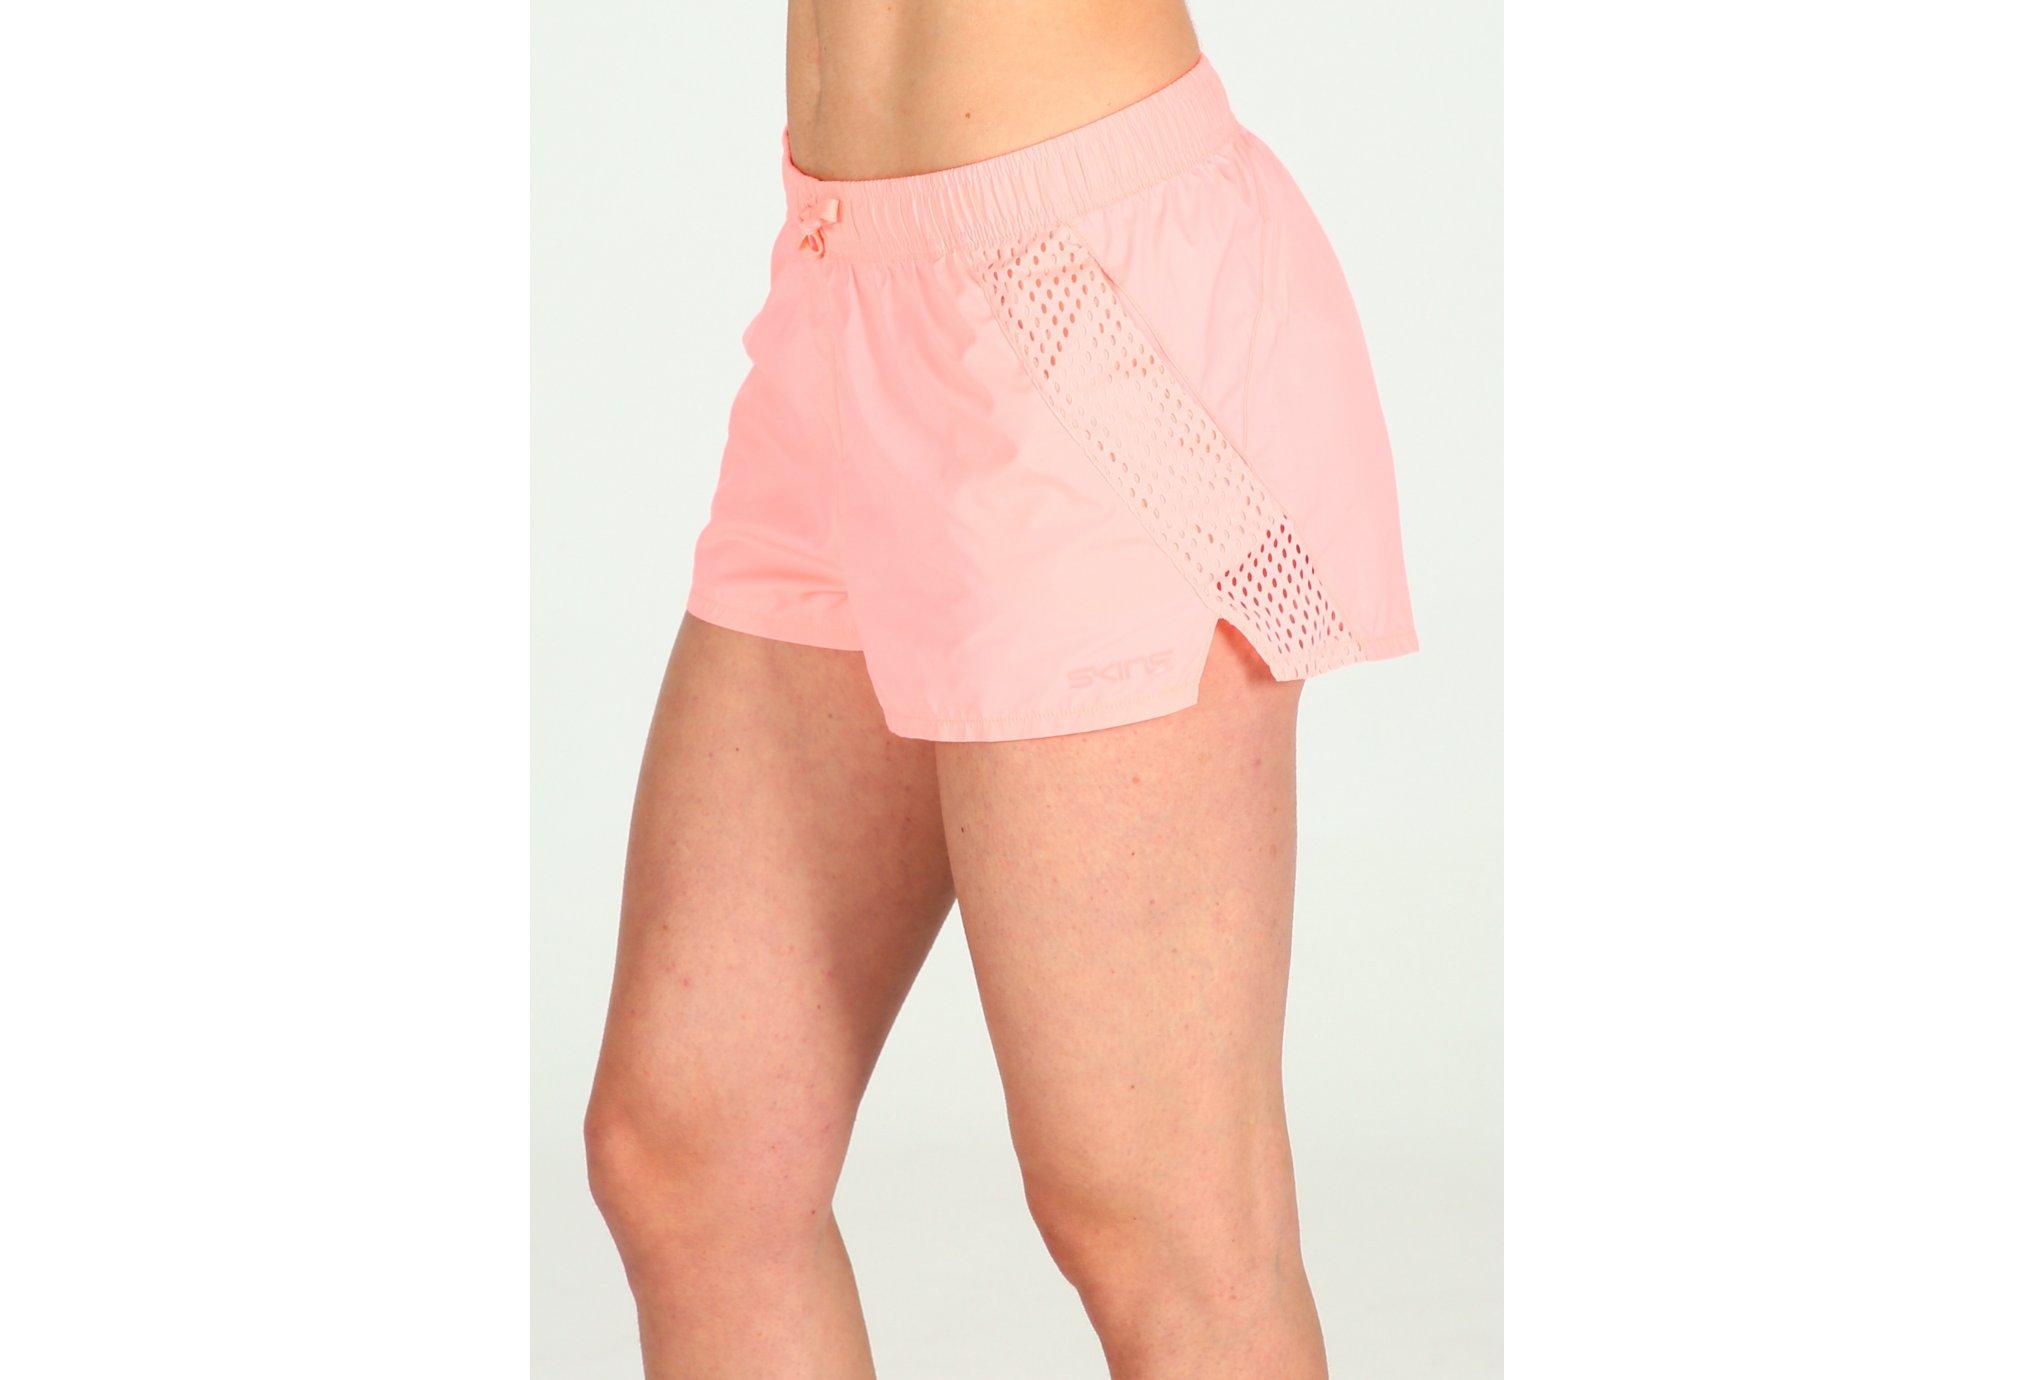 Skins Activewear Cone W vêtement running femme